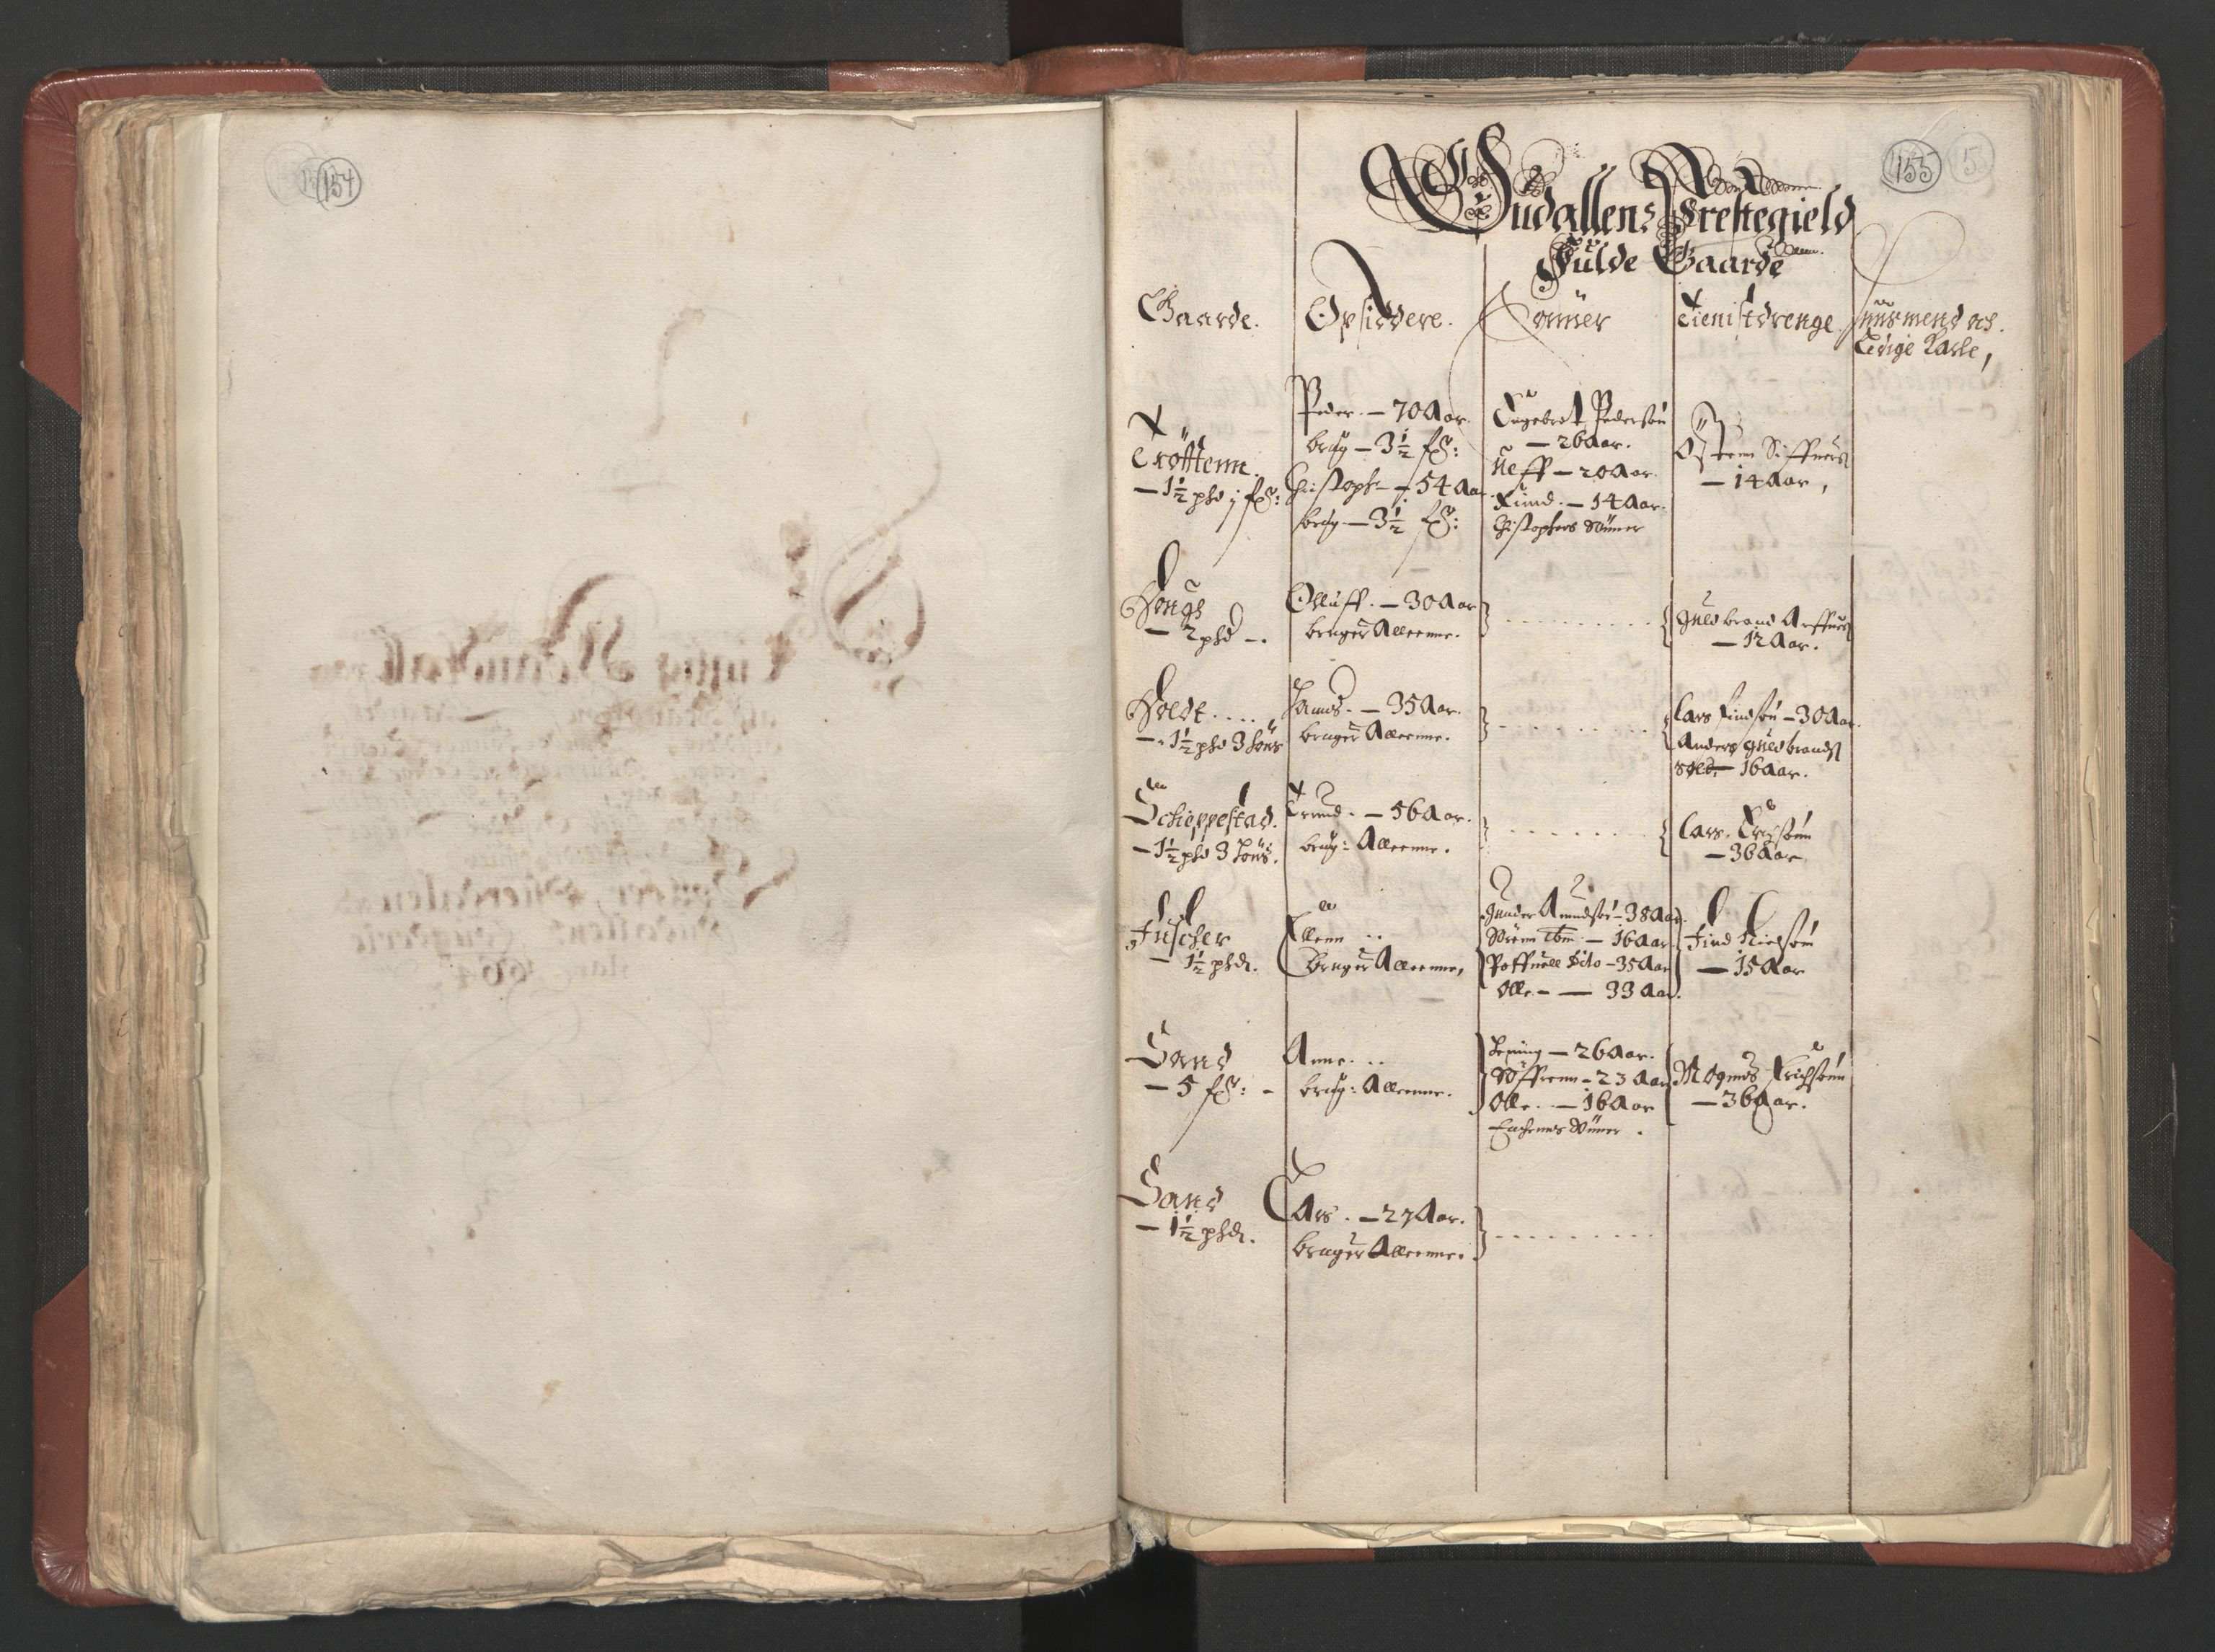 RA, Fogdenes og sorenskrivernes manntall 1664-1666, nr. 3: Hedmark fogderi og Solør, Østerdal og Odal fogderi, 1664, s. 154-155